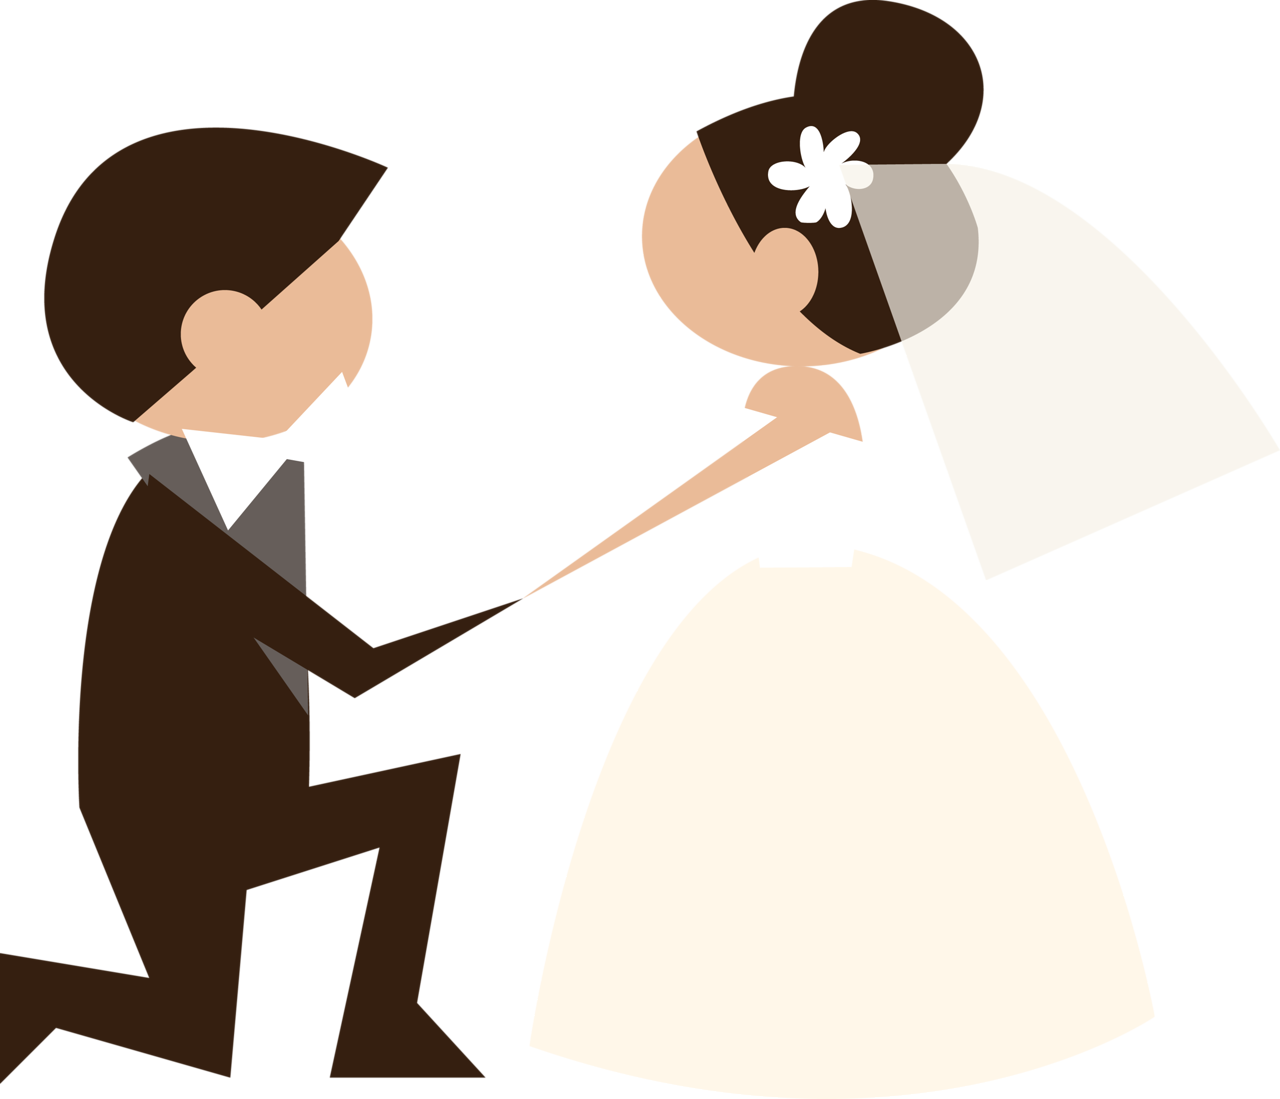 CASAMENTO | wedding | Pinterest | Wedding, Clip art and ...